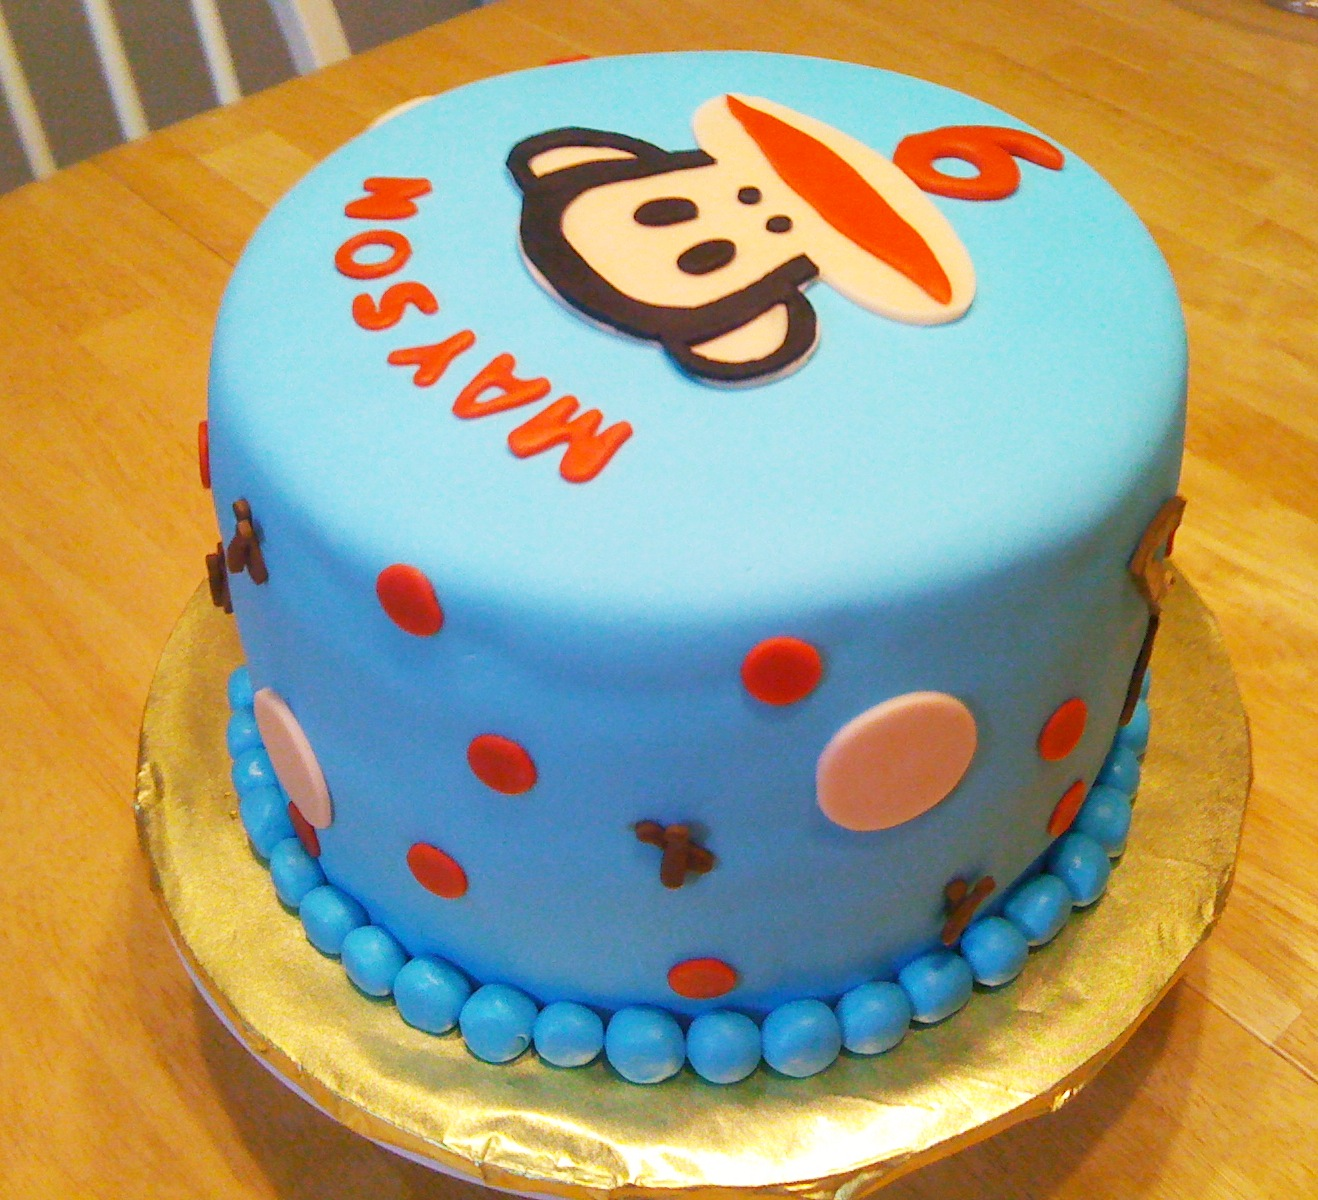 Aggies Do It Better: Paul Frank Monkey Cake